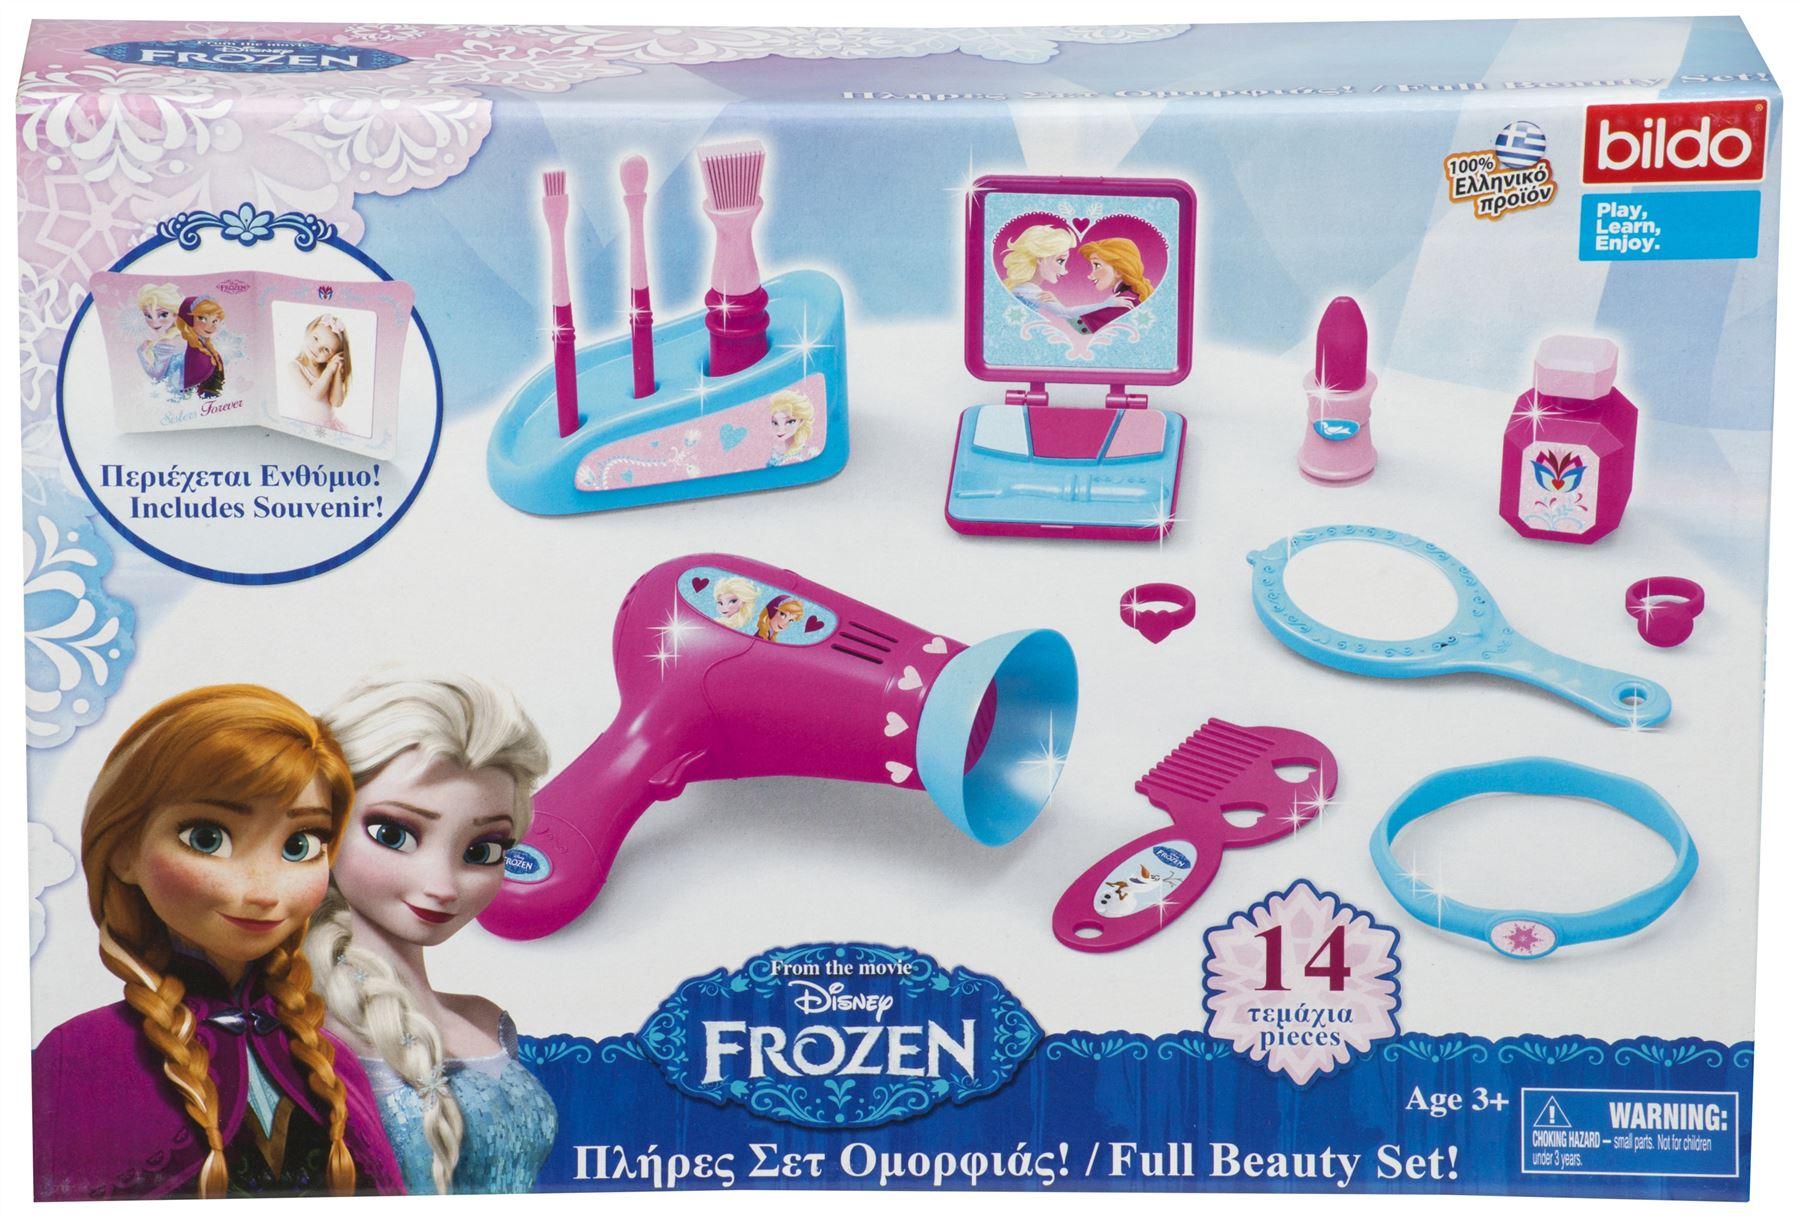 Disney Minnie Mouse Chair & Frozen Kitchen Tea Set Beauty Set Toy ...